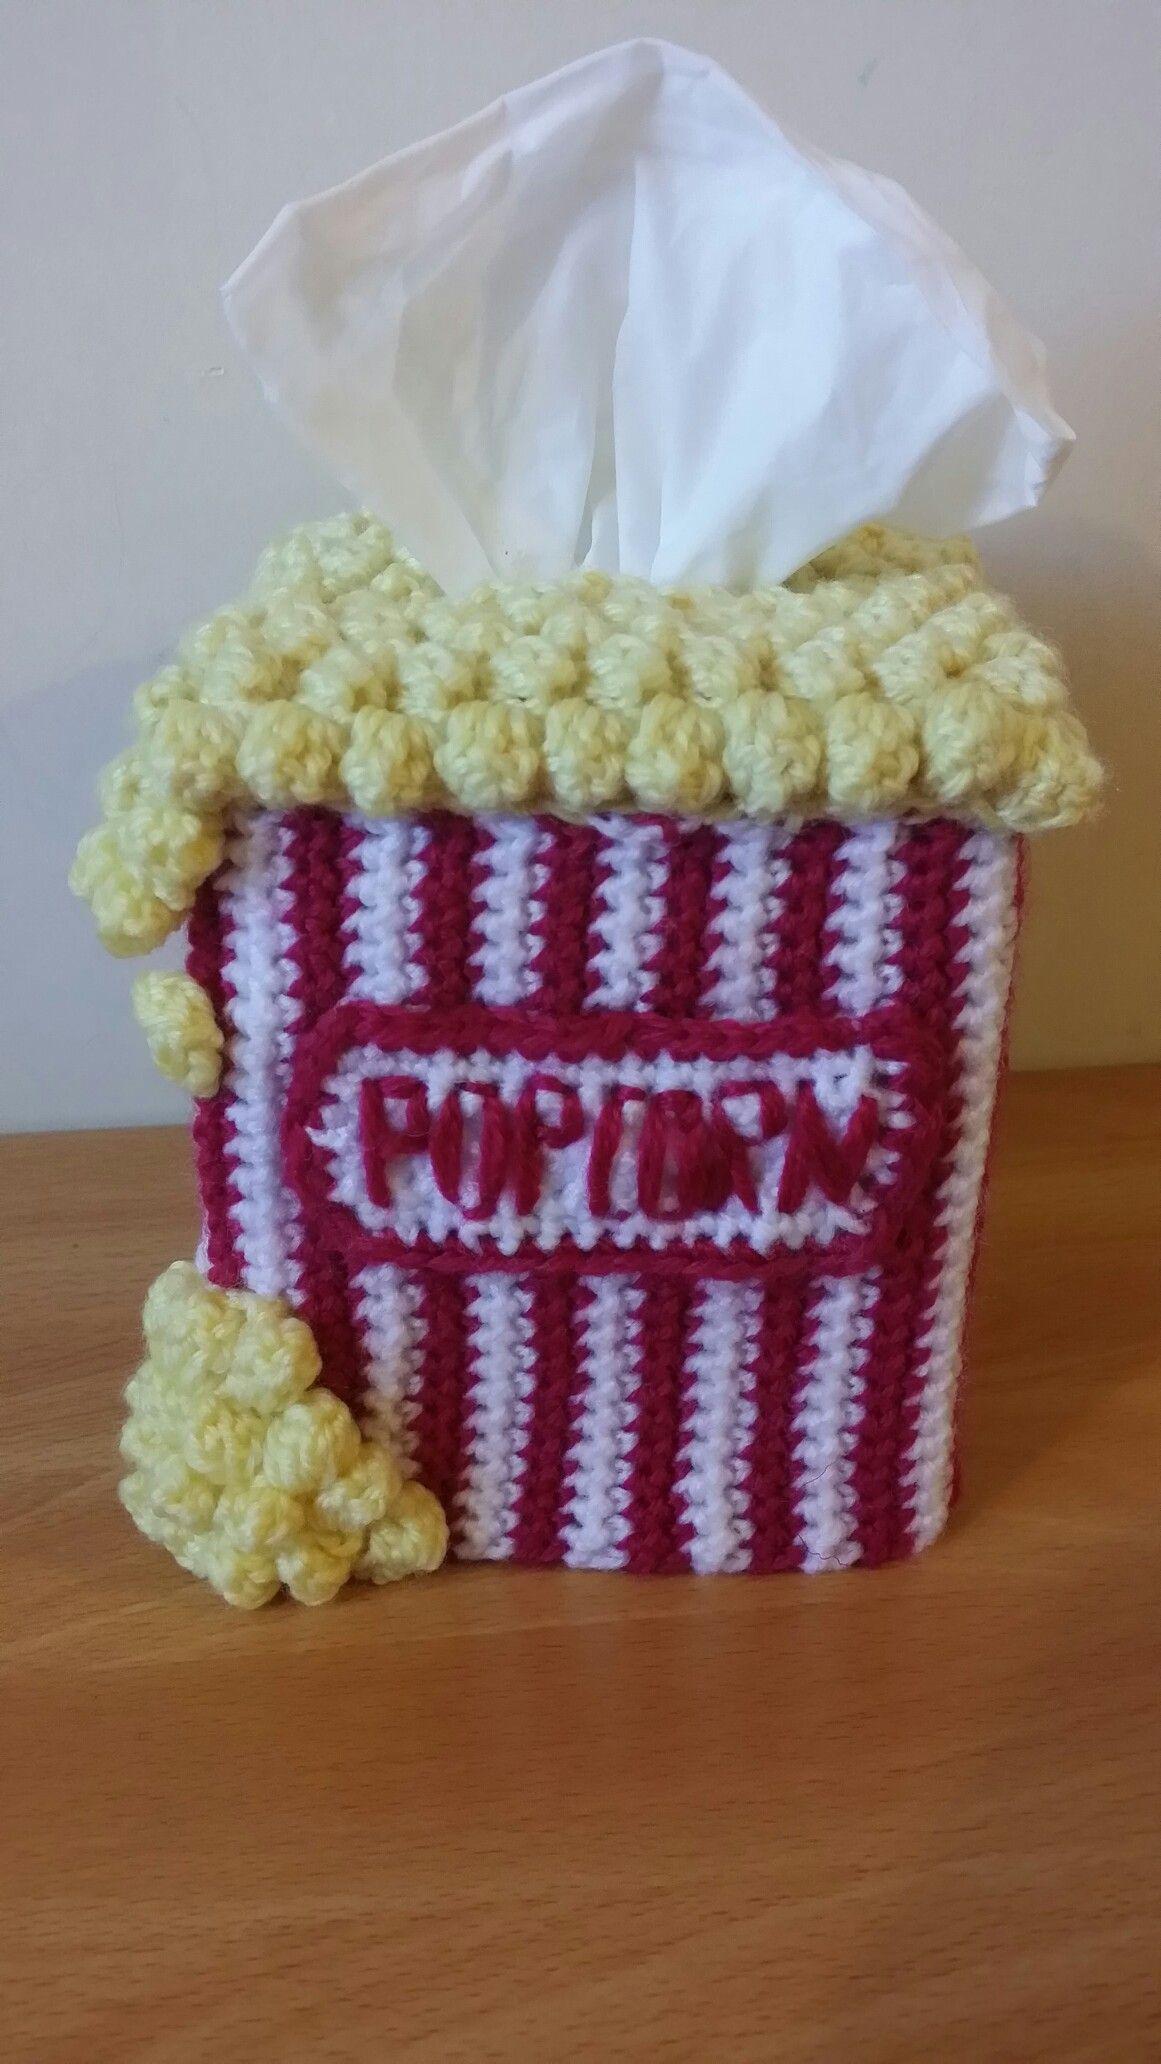 Crochet Popcorn Tissue Box Cover Cozy Pinte Macaron Kotak Tisu Choco More Plastic